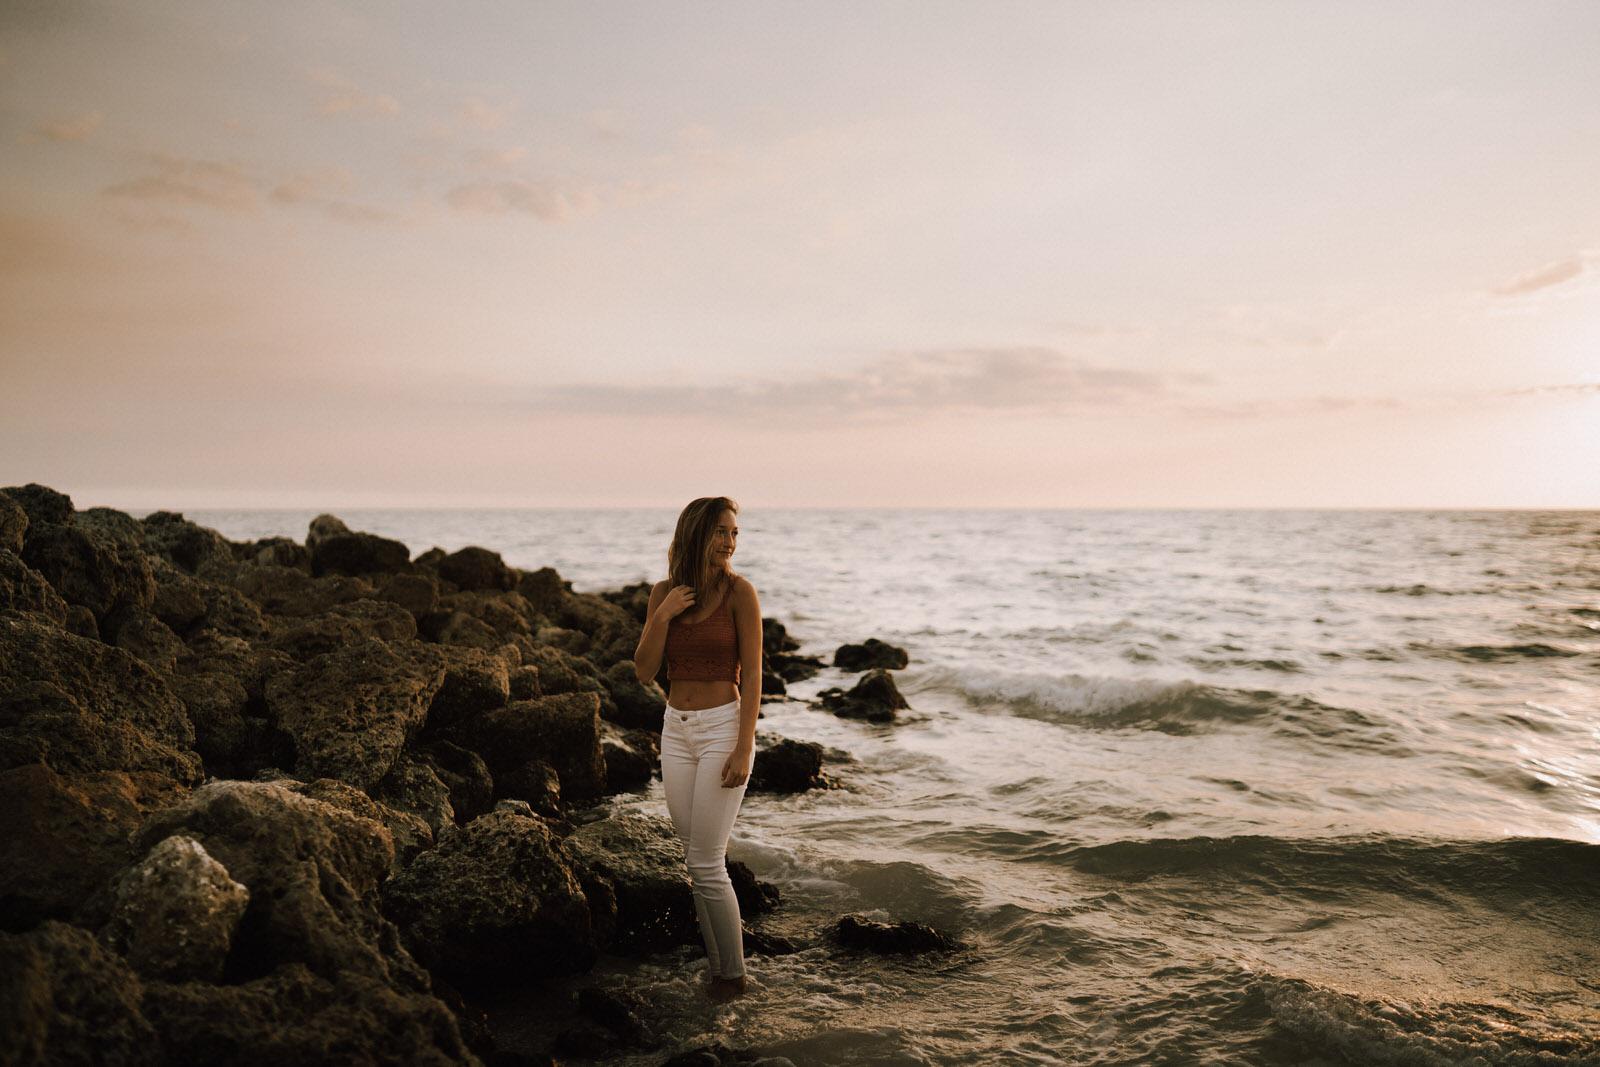 Fort Myers Senior Photos on Bonita Beach - Michelle Gonzalez Photography - Sammie-137.JPG